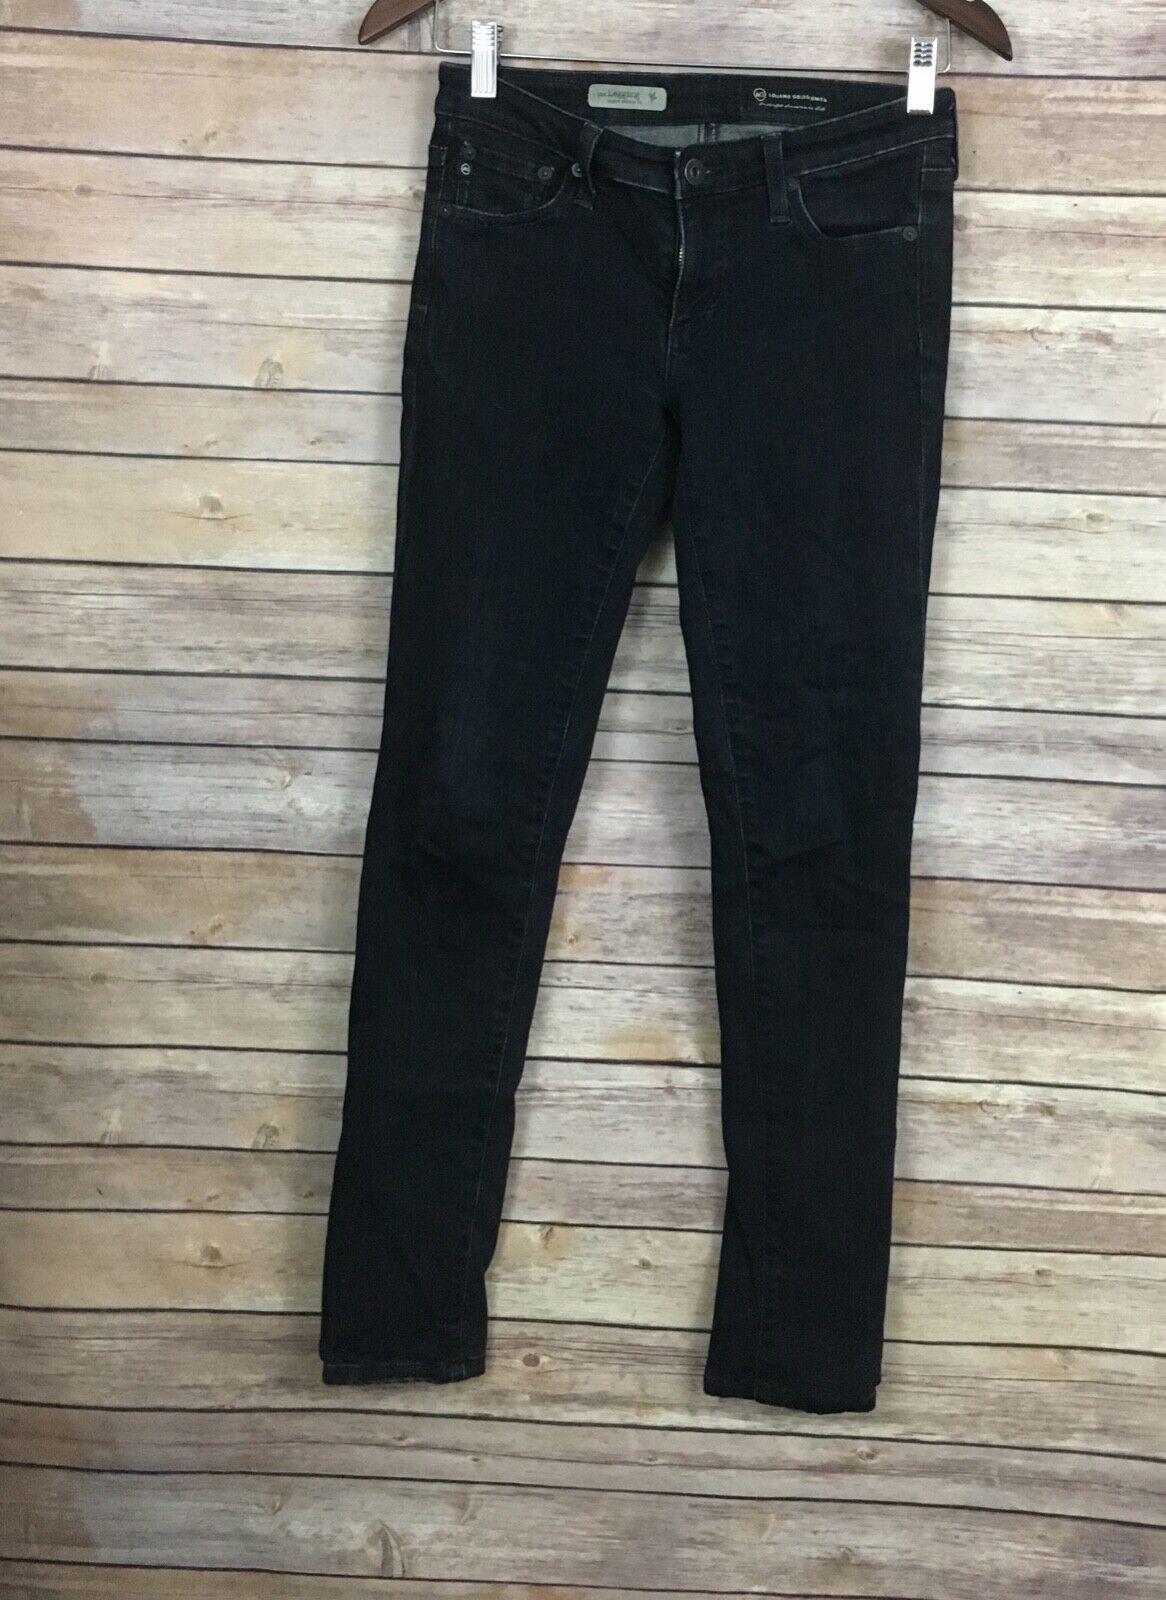 AG The Legging Super Skinny Jeans (Size  27)